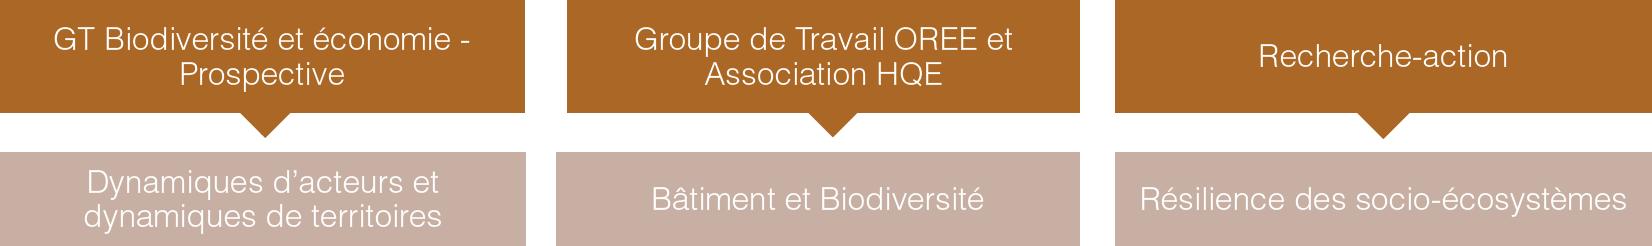 Axe priorite biodiversite OREE